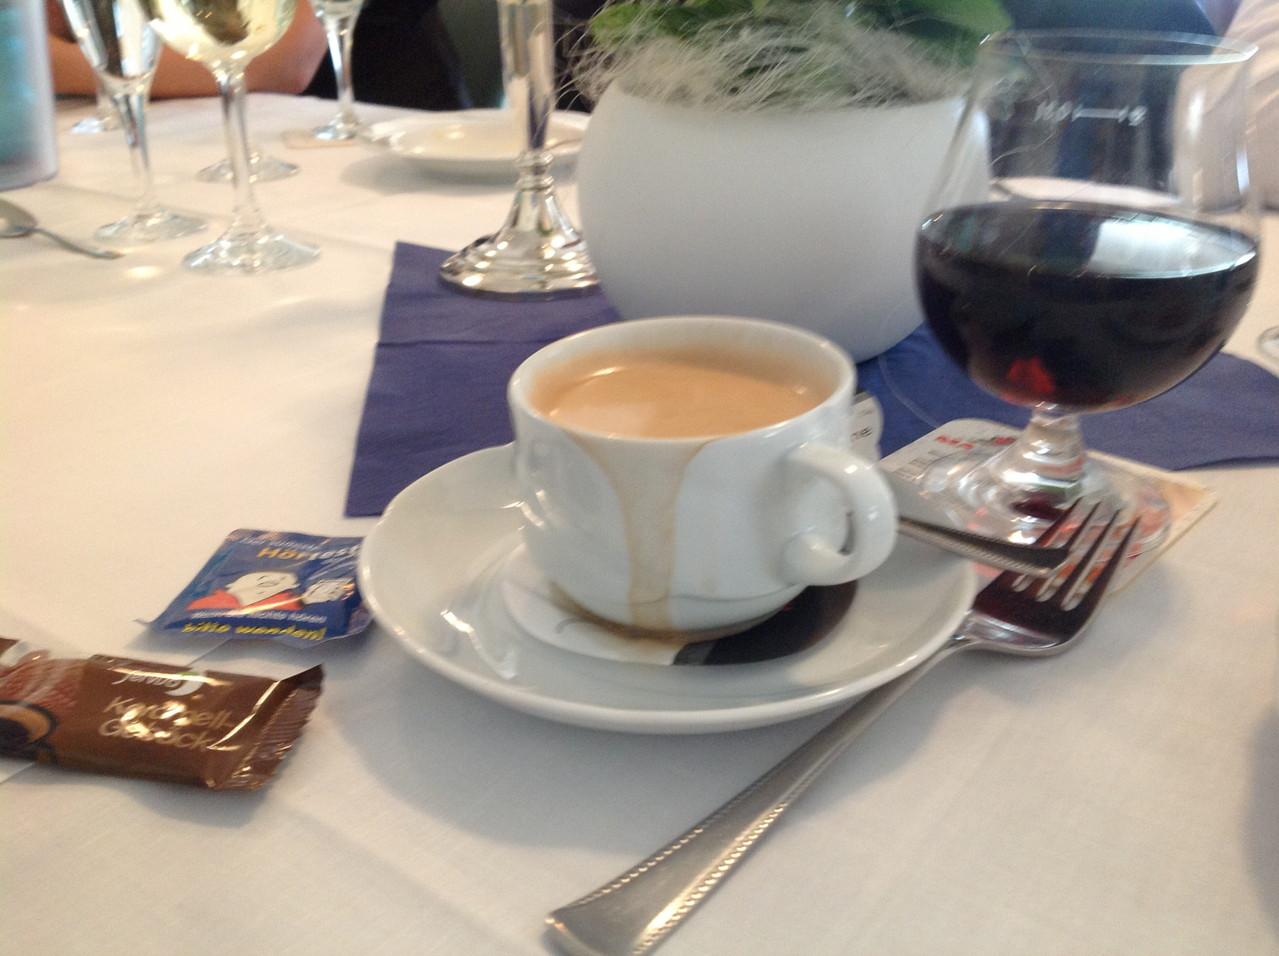 Karamellgebäck, Kaffee Crema, Zucker